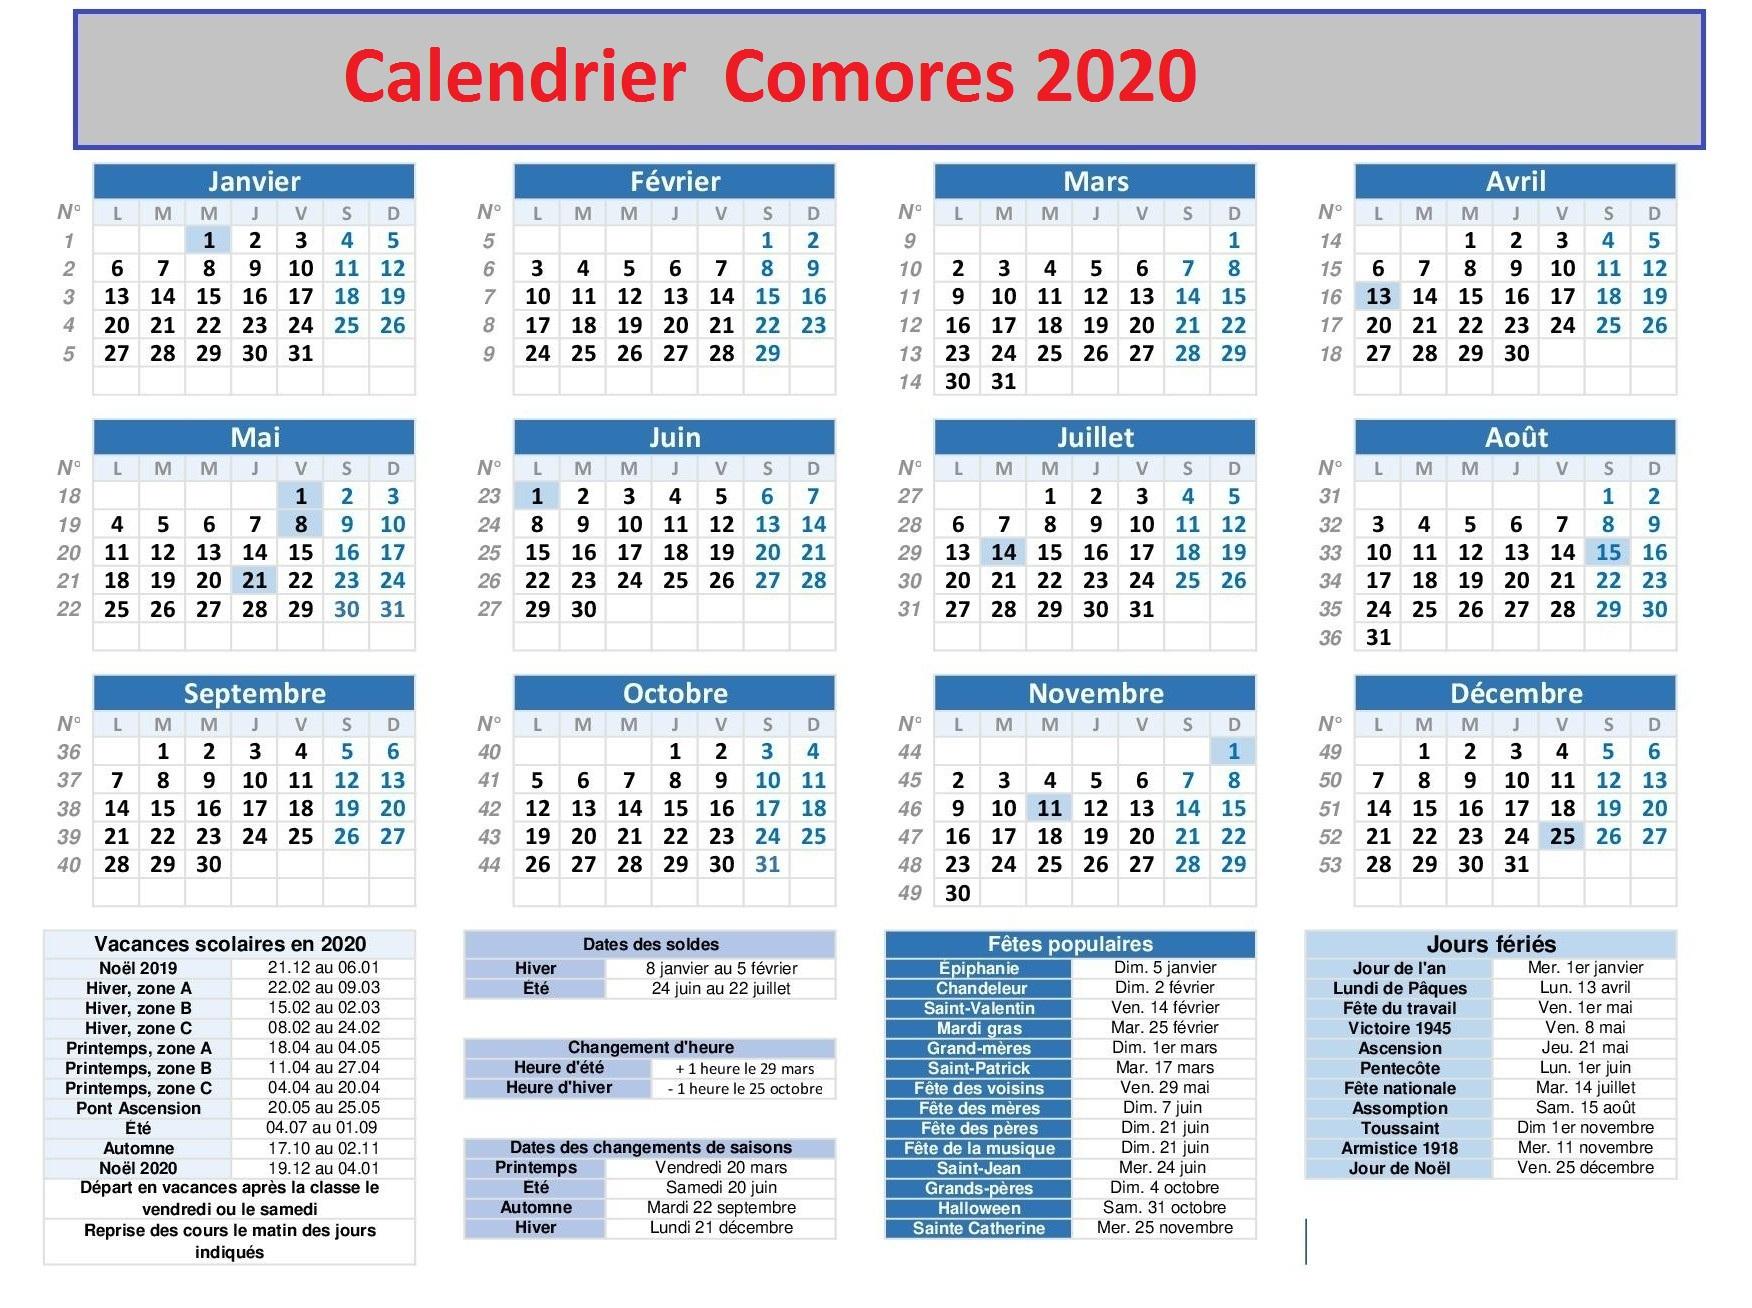 Calendrier Campus France Comores 2020